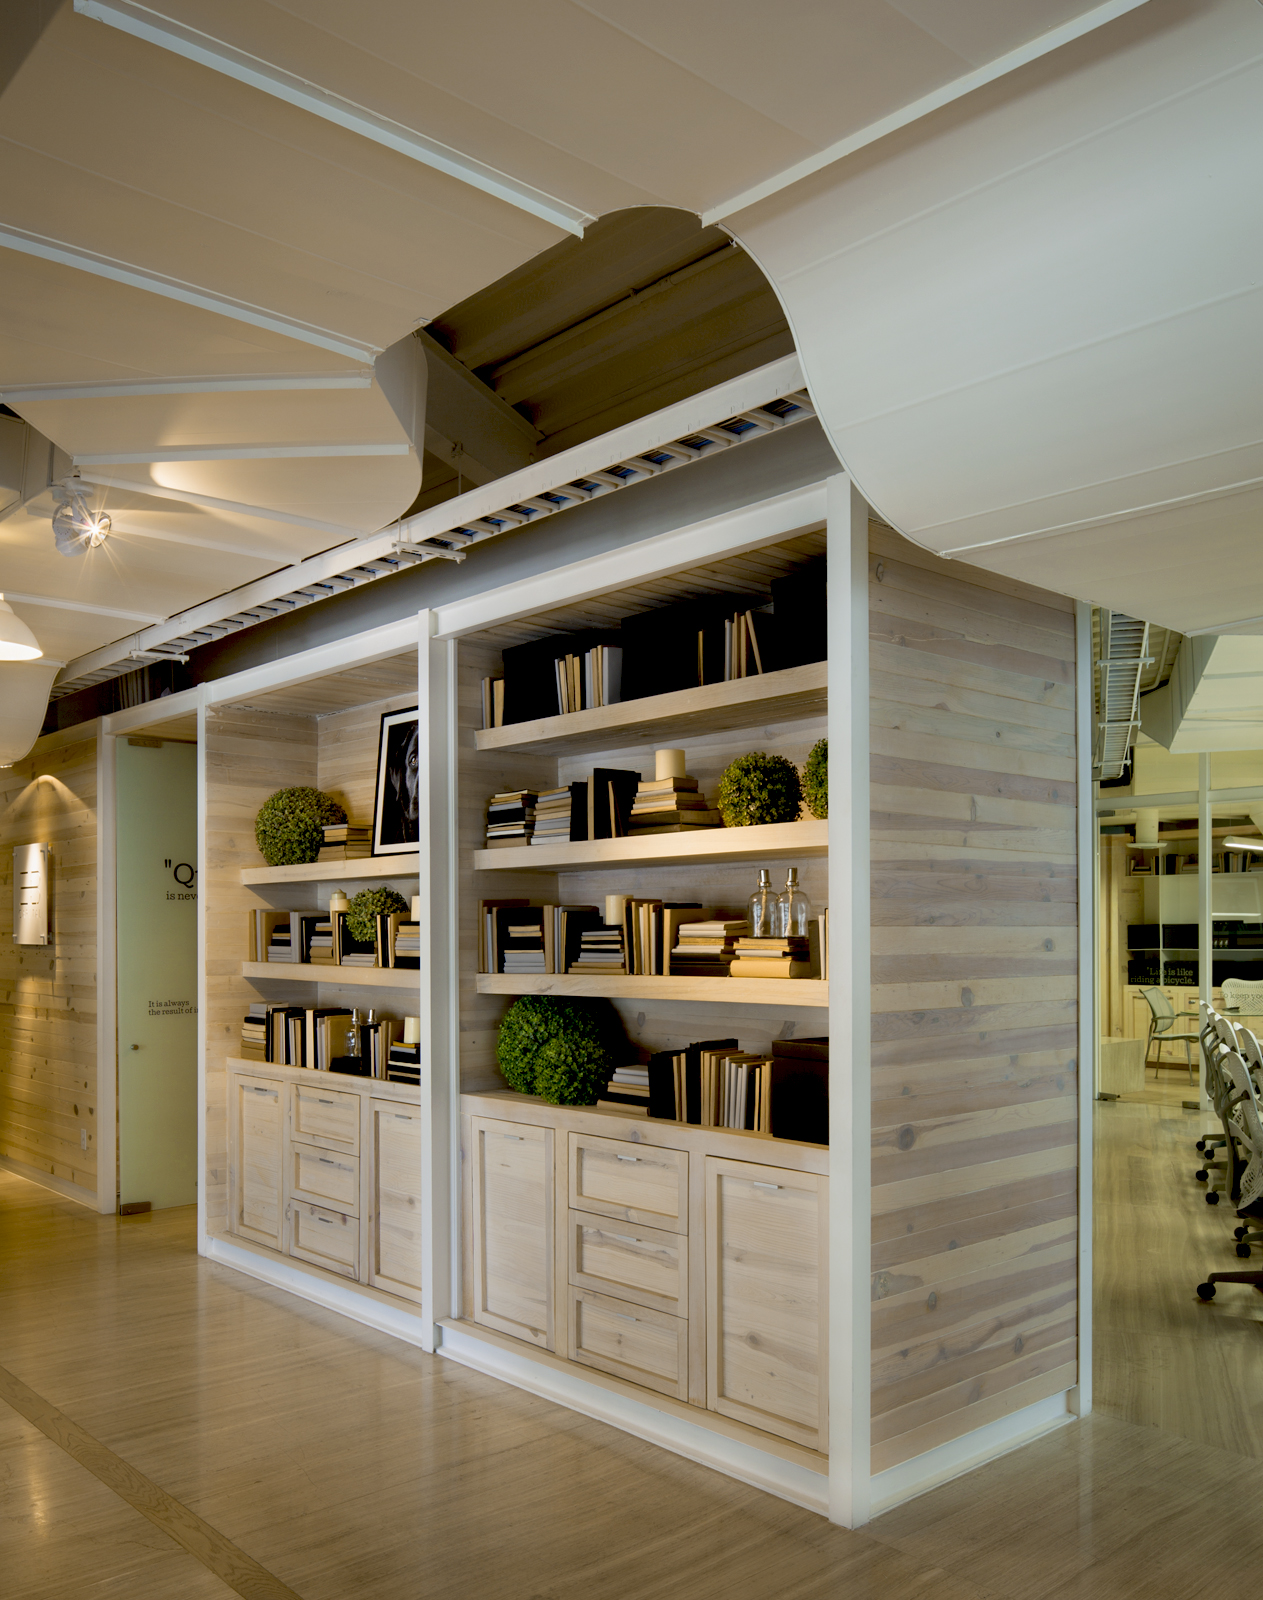 insignias-interiorismo-arquitectura-oficinas-tamarindo-madera-despacho-artigas-arquitectos-3